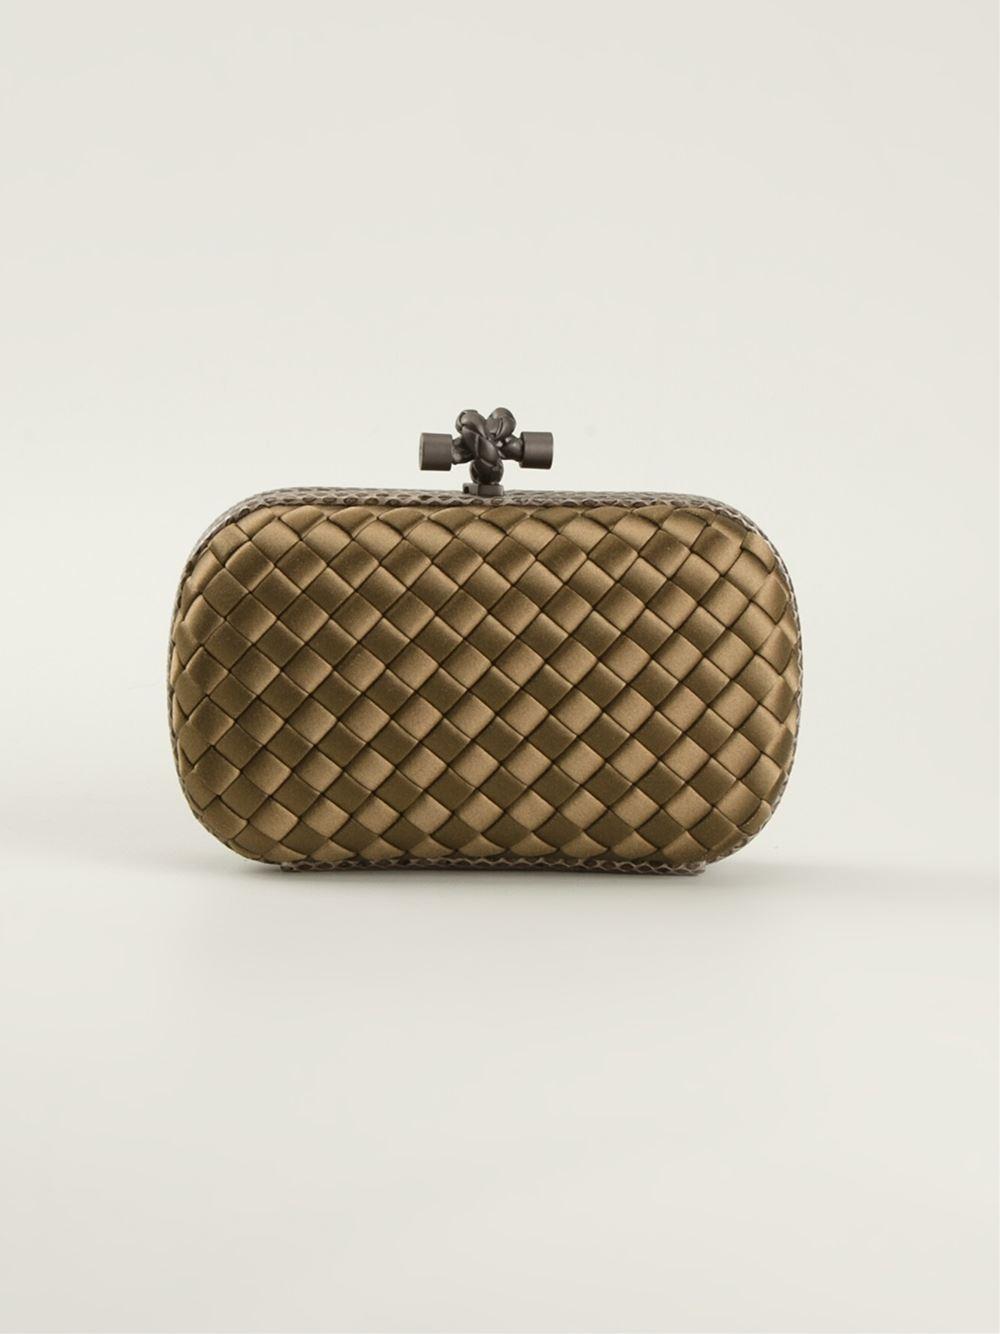 bottega veneta 39 knot 39 box clutch in brown lyst. Black Bedroom Furniture Sets. Home Design Ideas